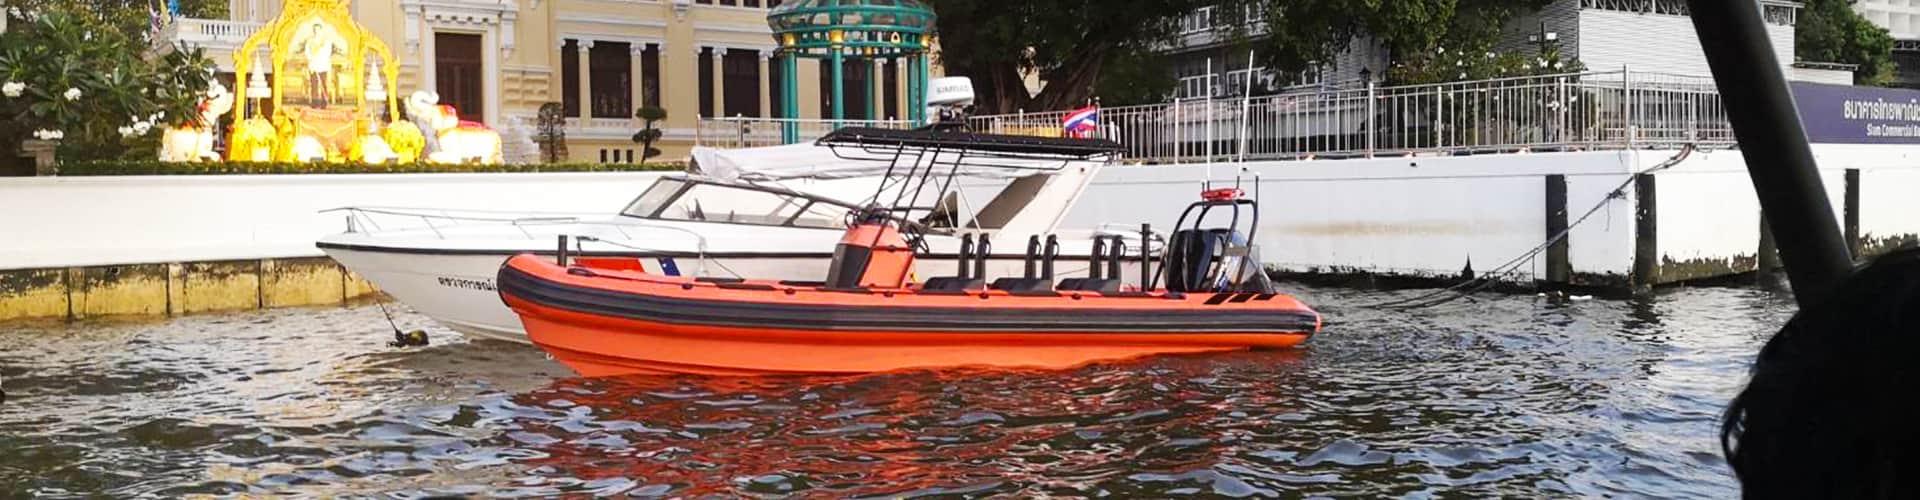 River Patrol RIB Boats